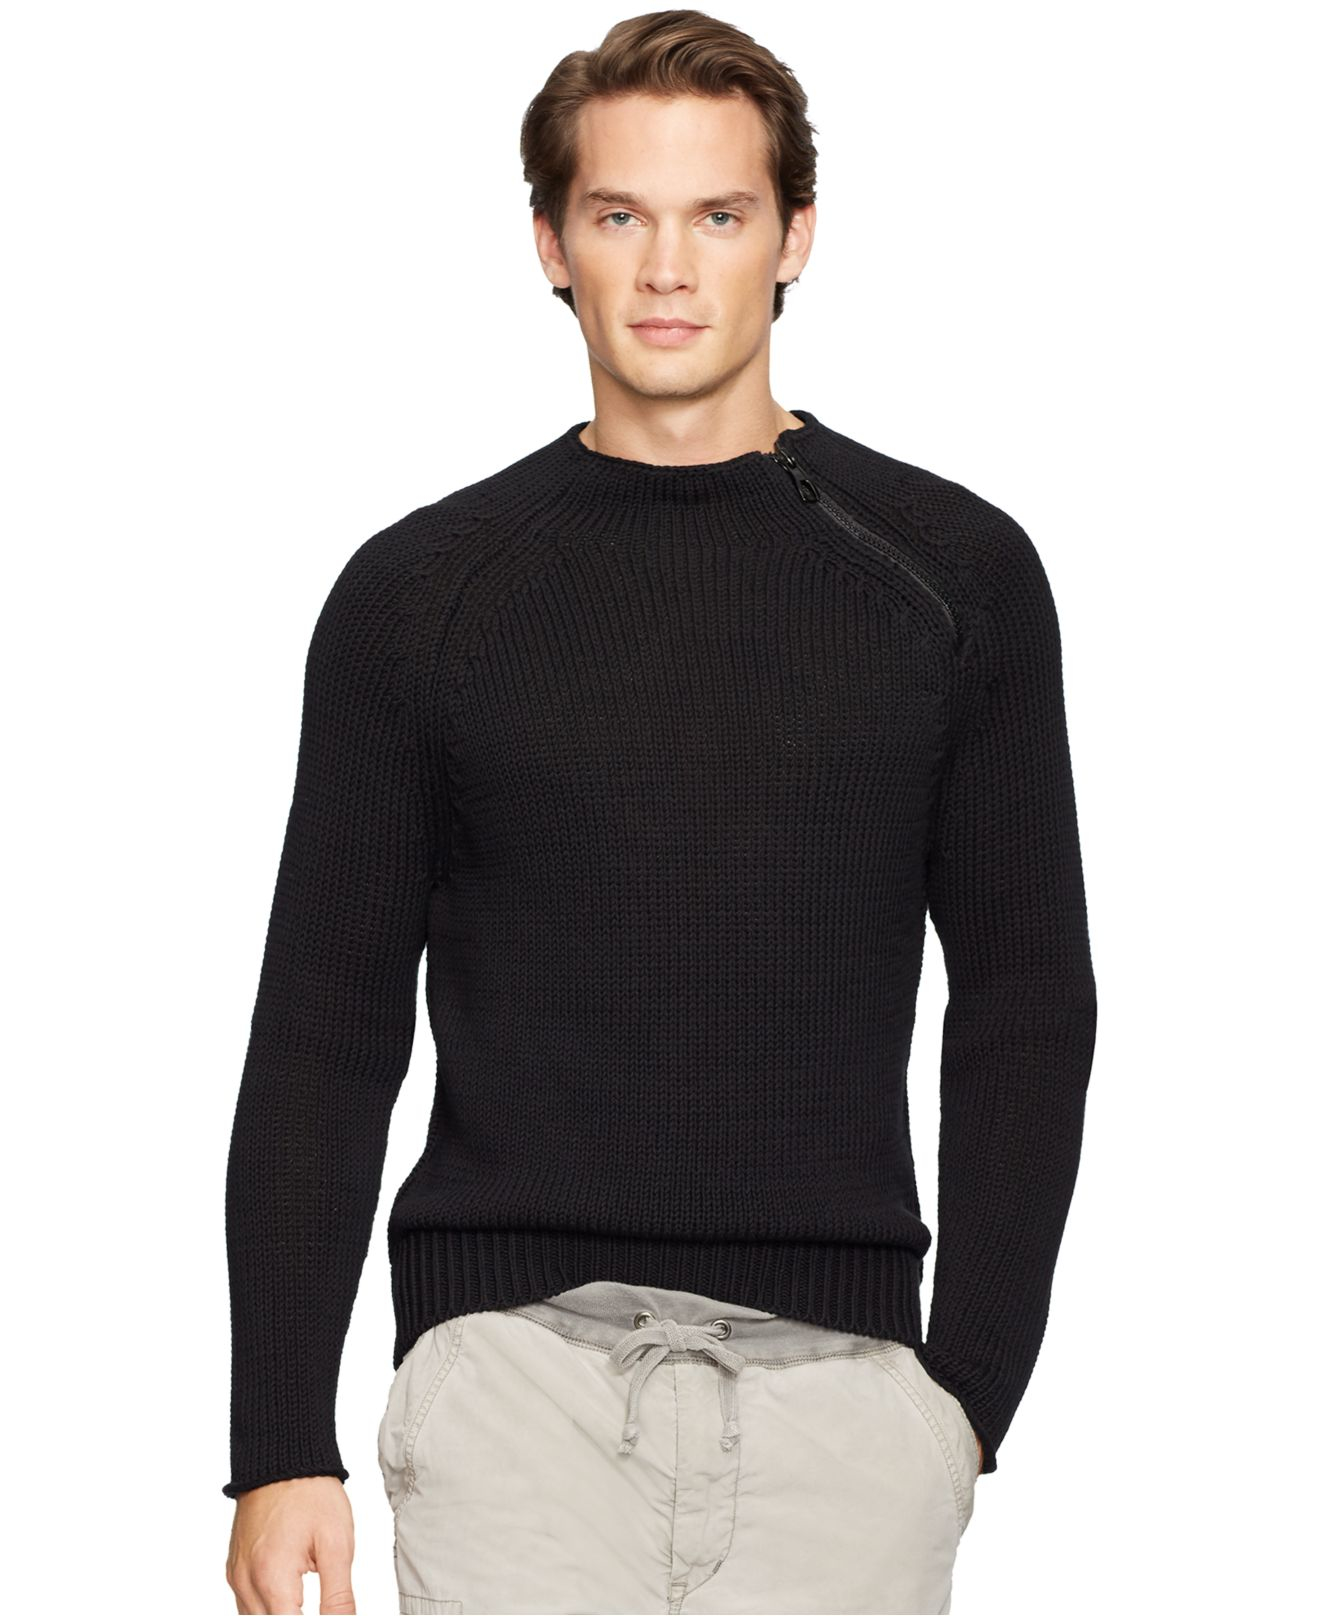 lyst polo ralph lauren crewneck zip sweater in black for men. Black Bedroom Furniture Sets. Home Design Ideas